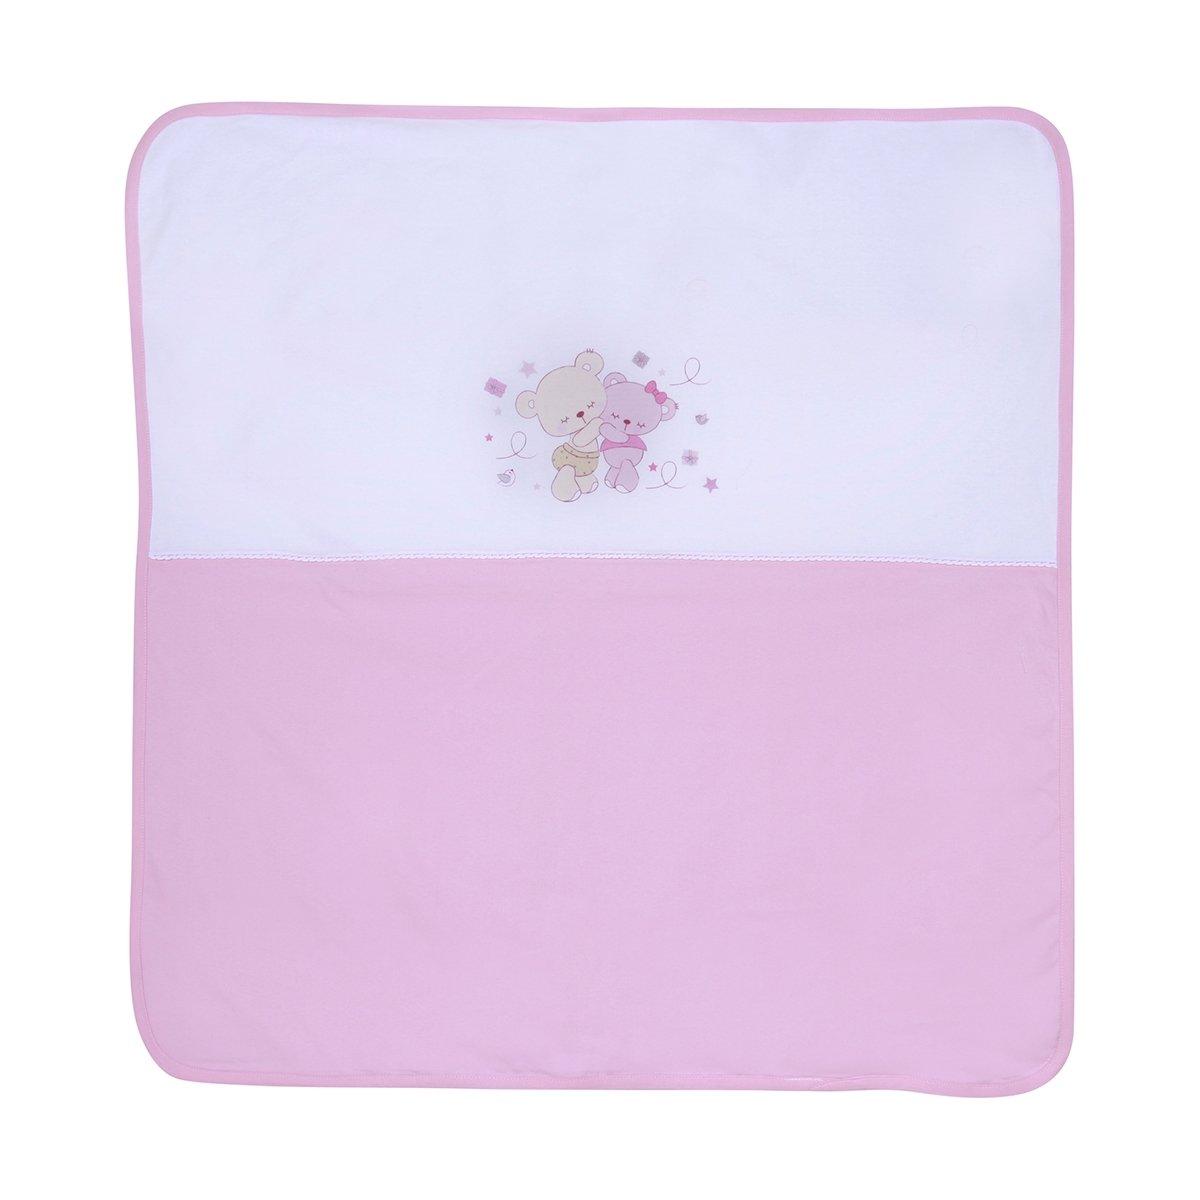 paturica bebe lorelli classic za za - pink, 90x90 cm